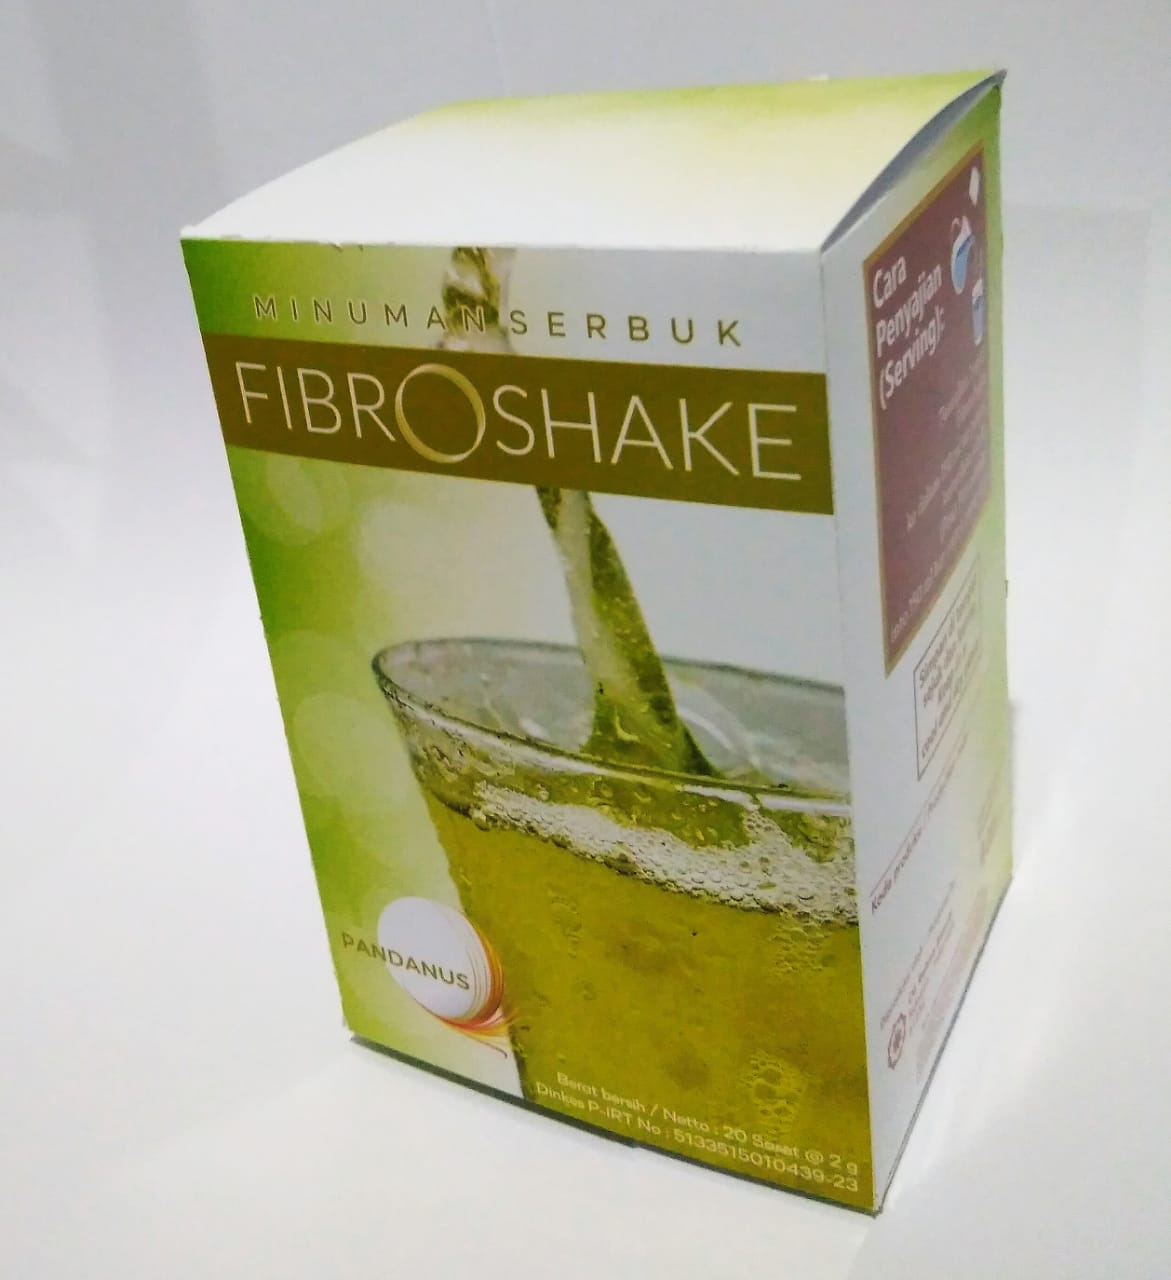 Fibroshake